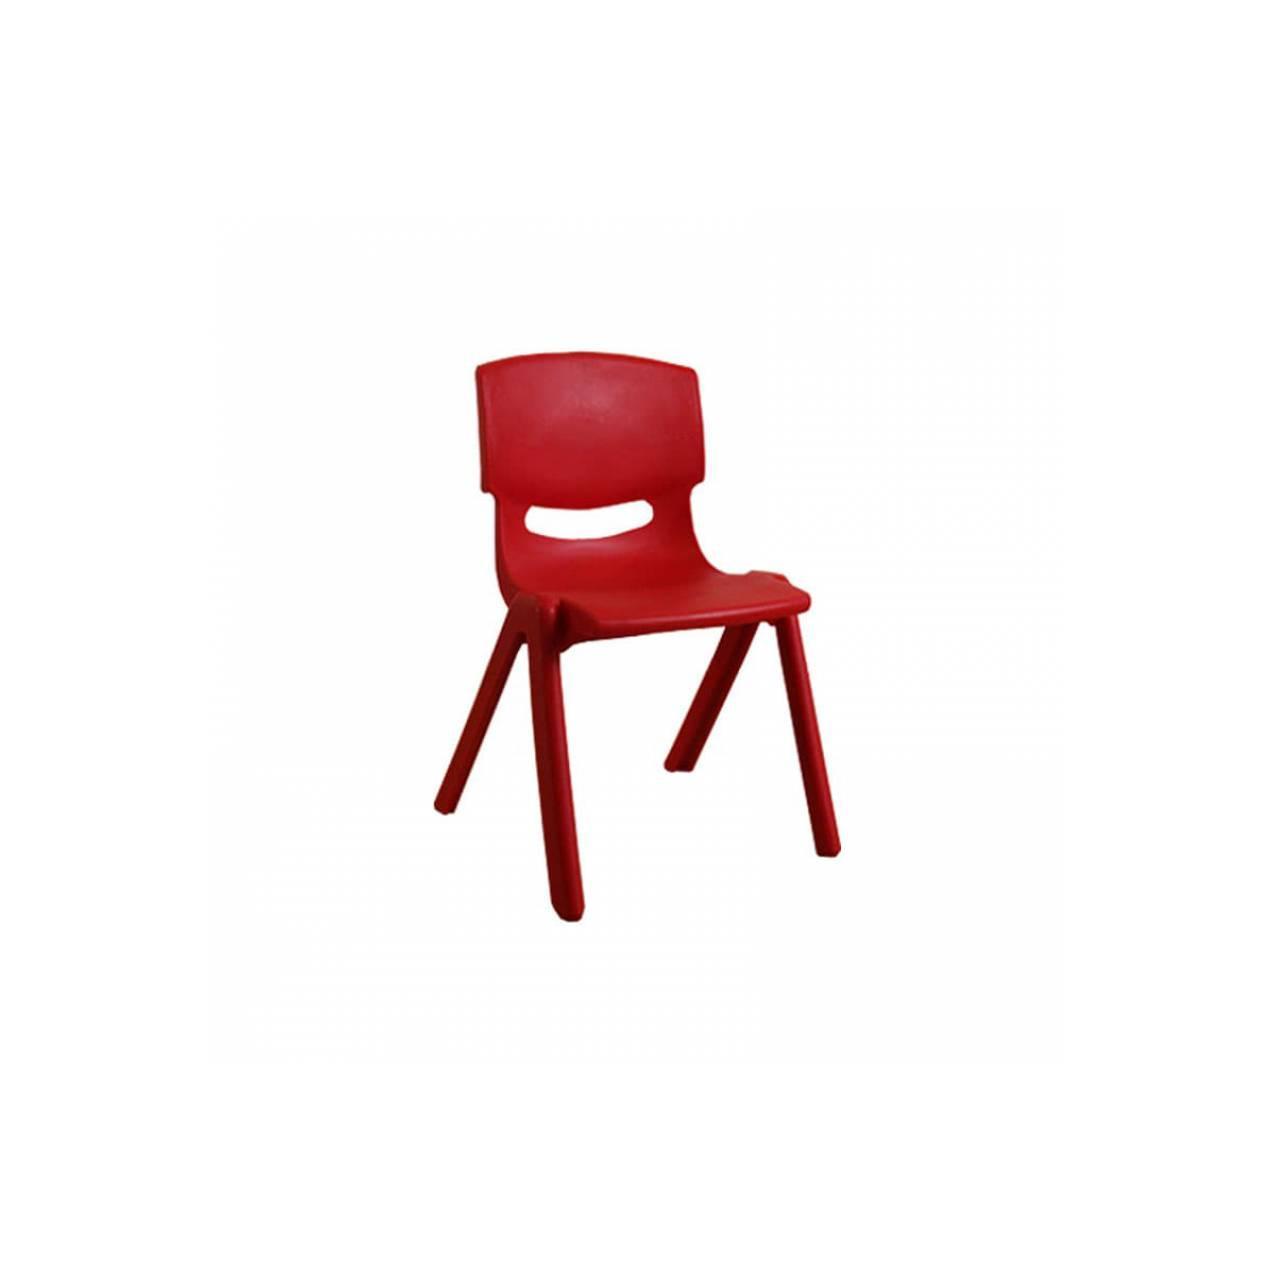 Kursi Anak Atria Shawn Kids Chair Red New